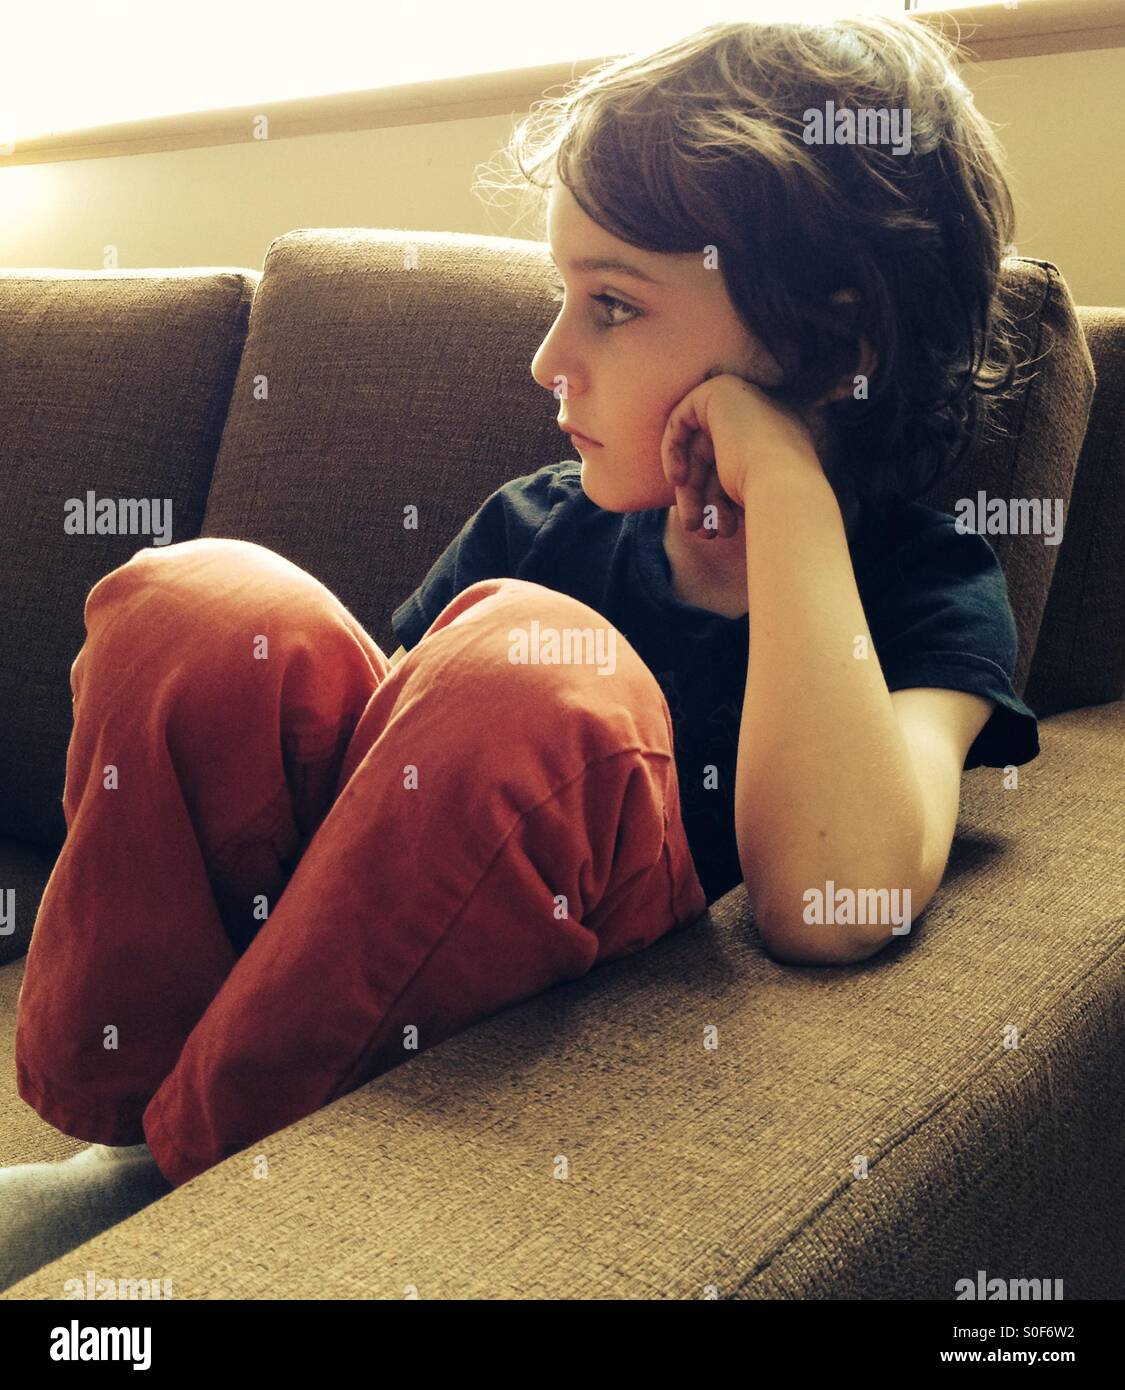 Pensive Child - Stock Image